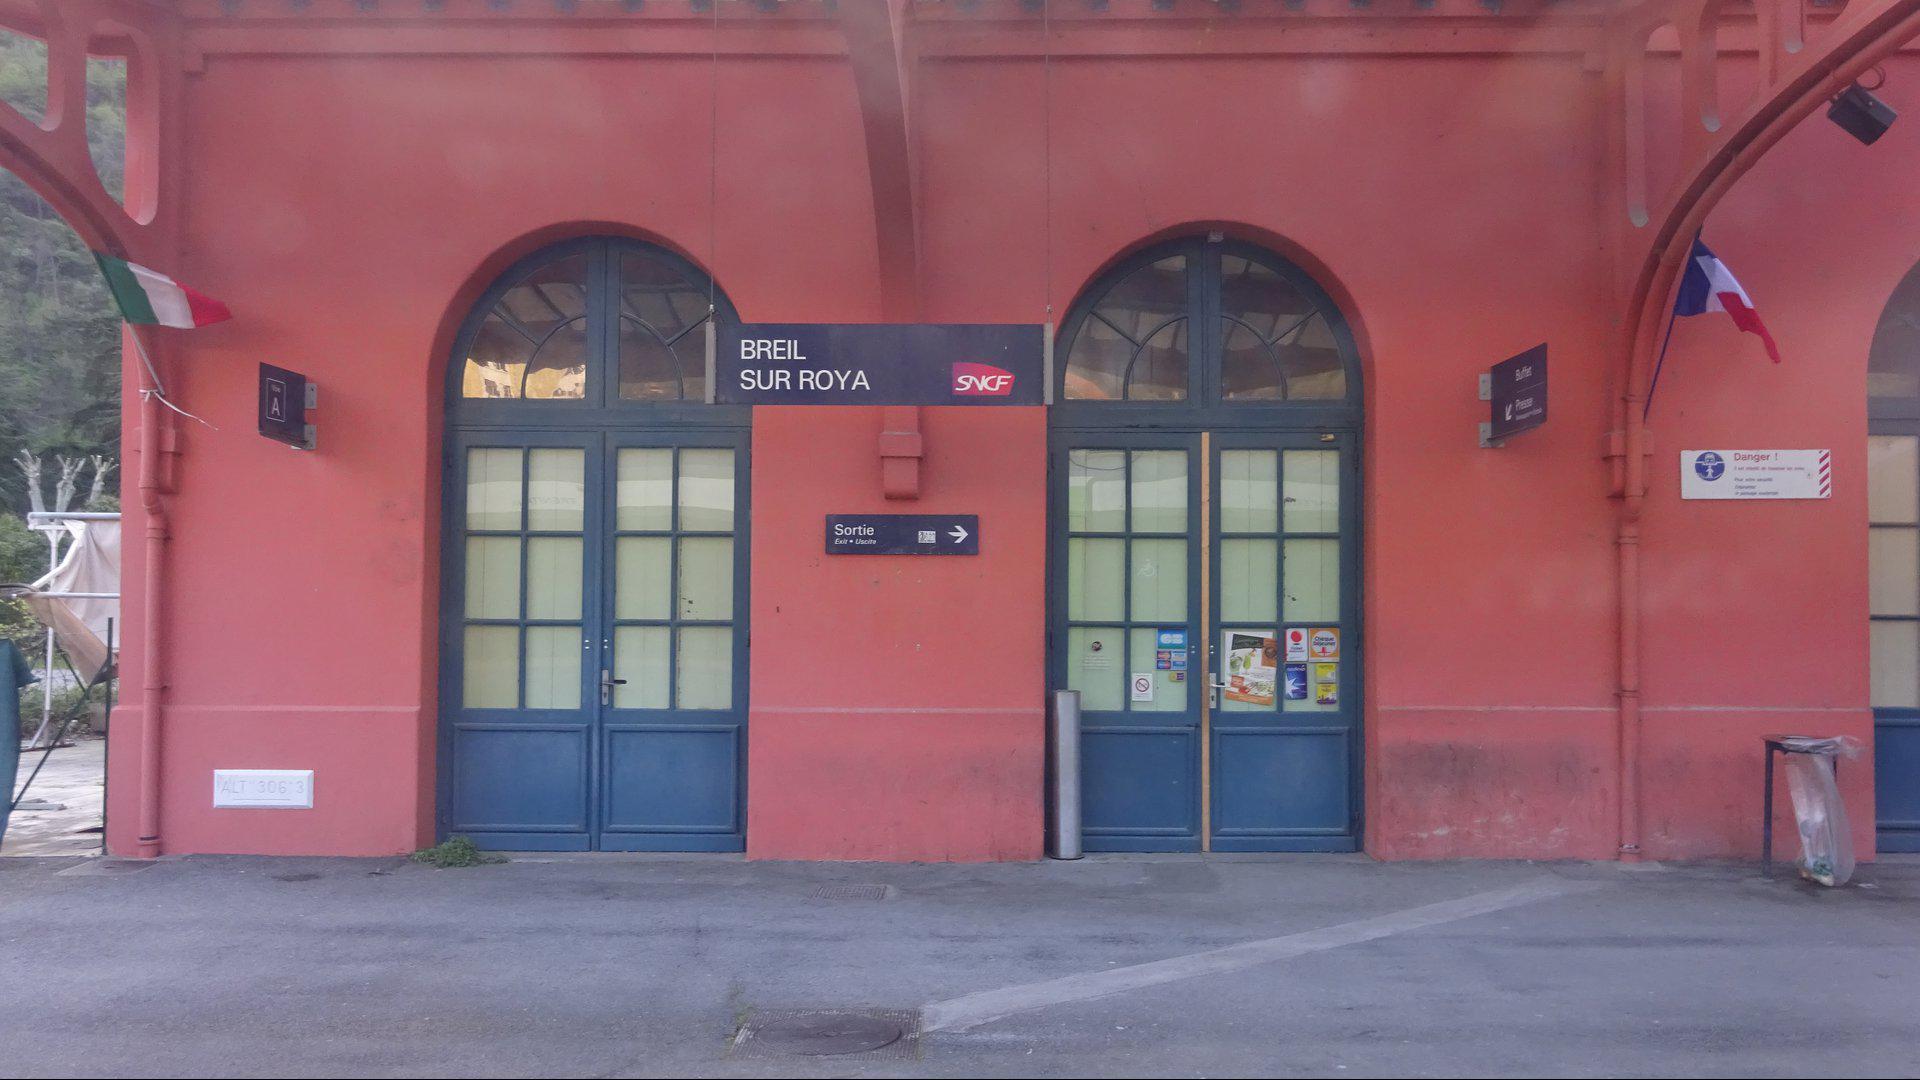 Breil-sur-Roya